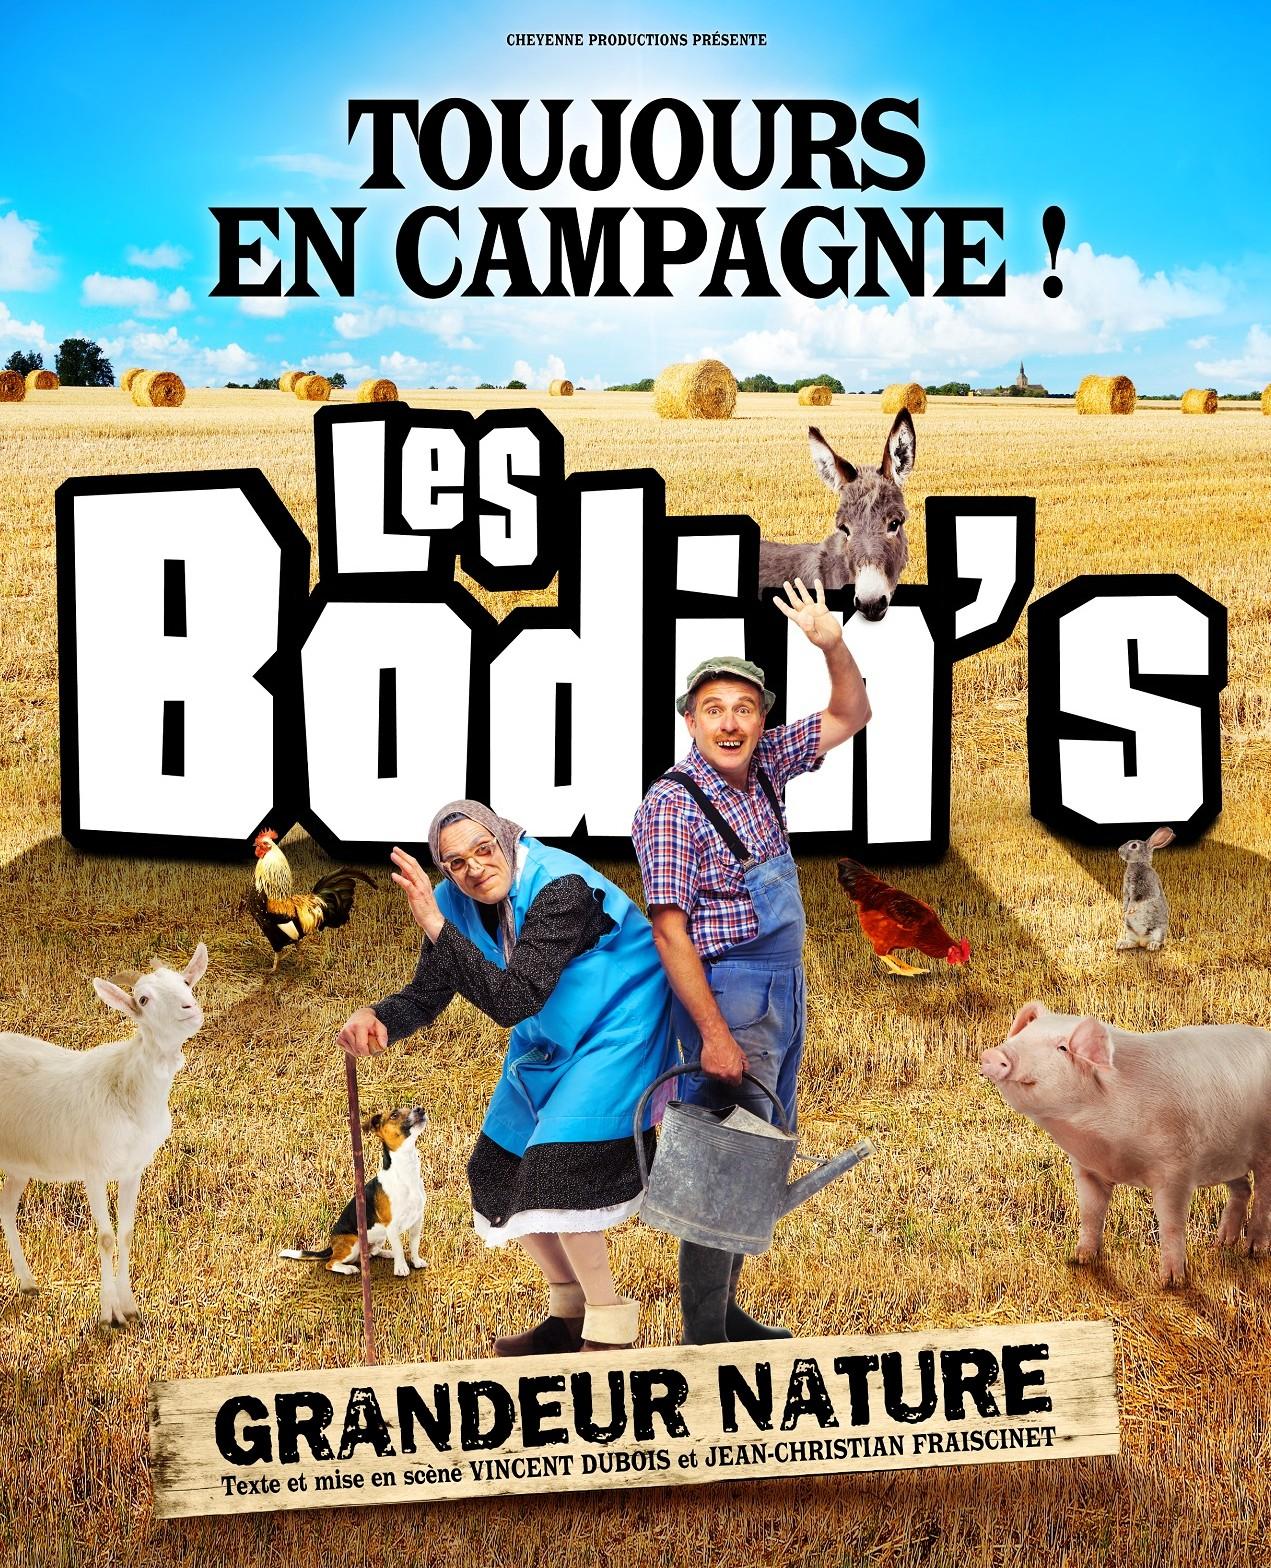 Les Bodins: Grandeur nature